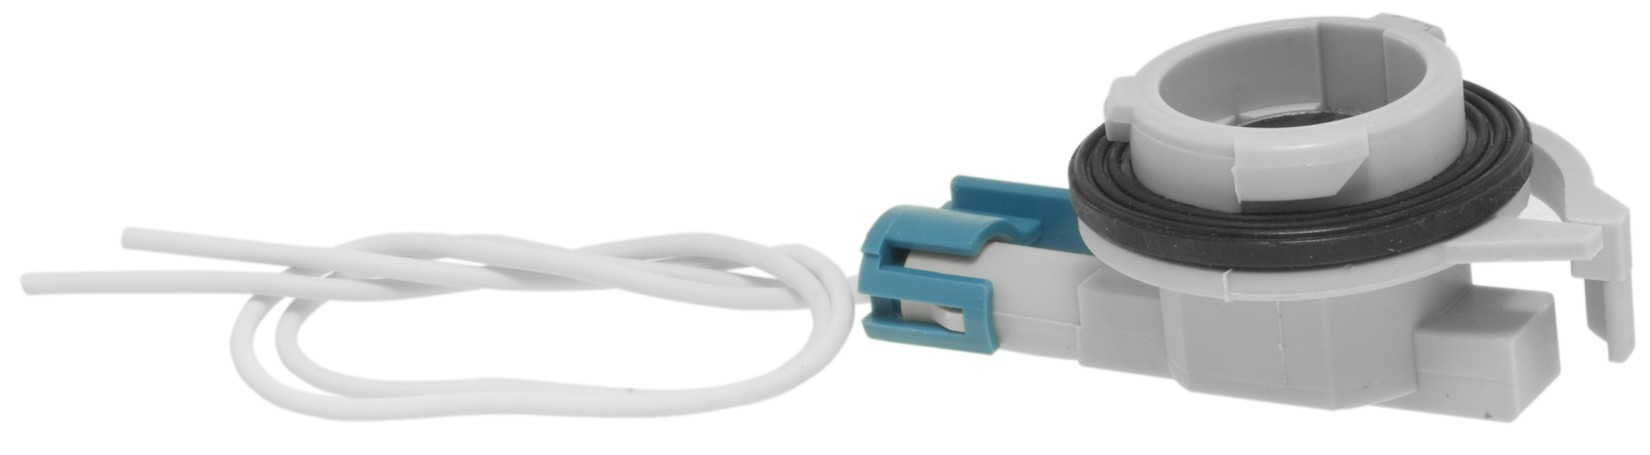 AIRTEX ENG MGMT SYSTEMS(DELETE V24A01R1) - Back Up Lamp Socket (Rear Right) - AEM 1P1482